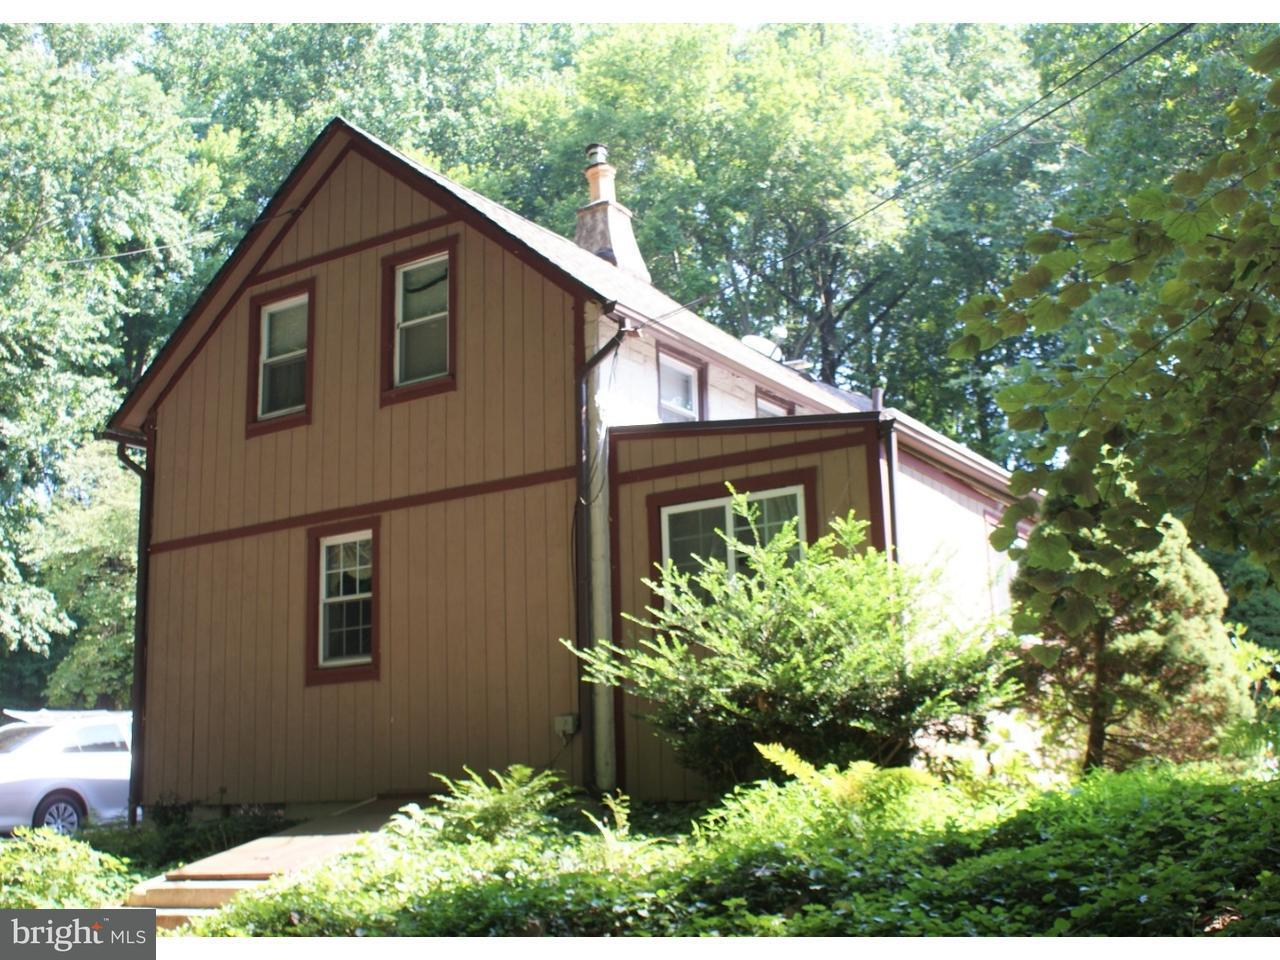 Single Family Home for Sale at 183 TRIMBLE Road Thornton, Pennsylvania 19373 United States